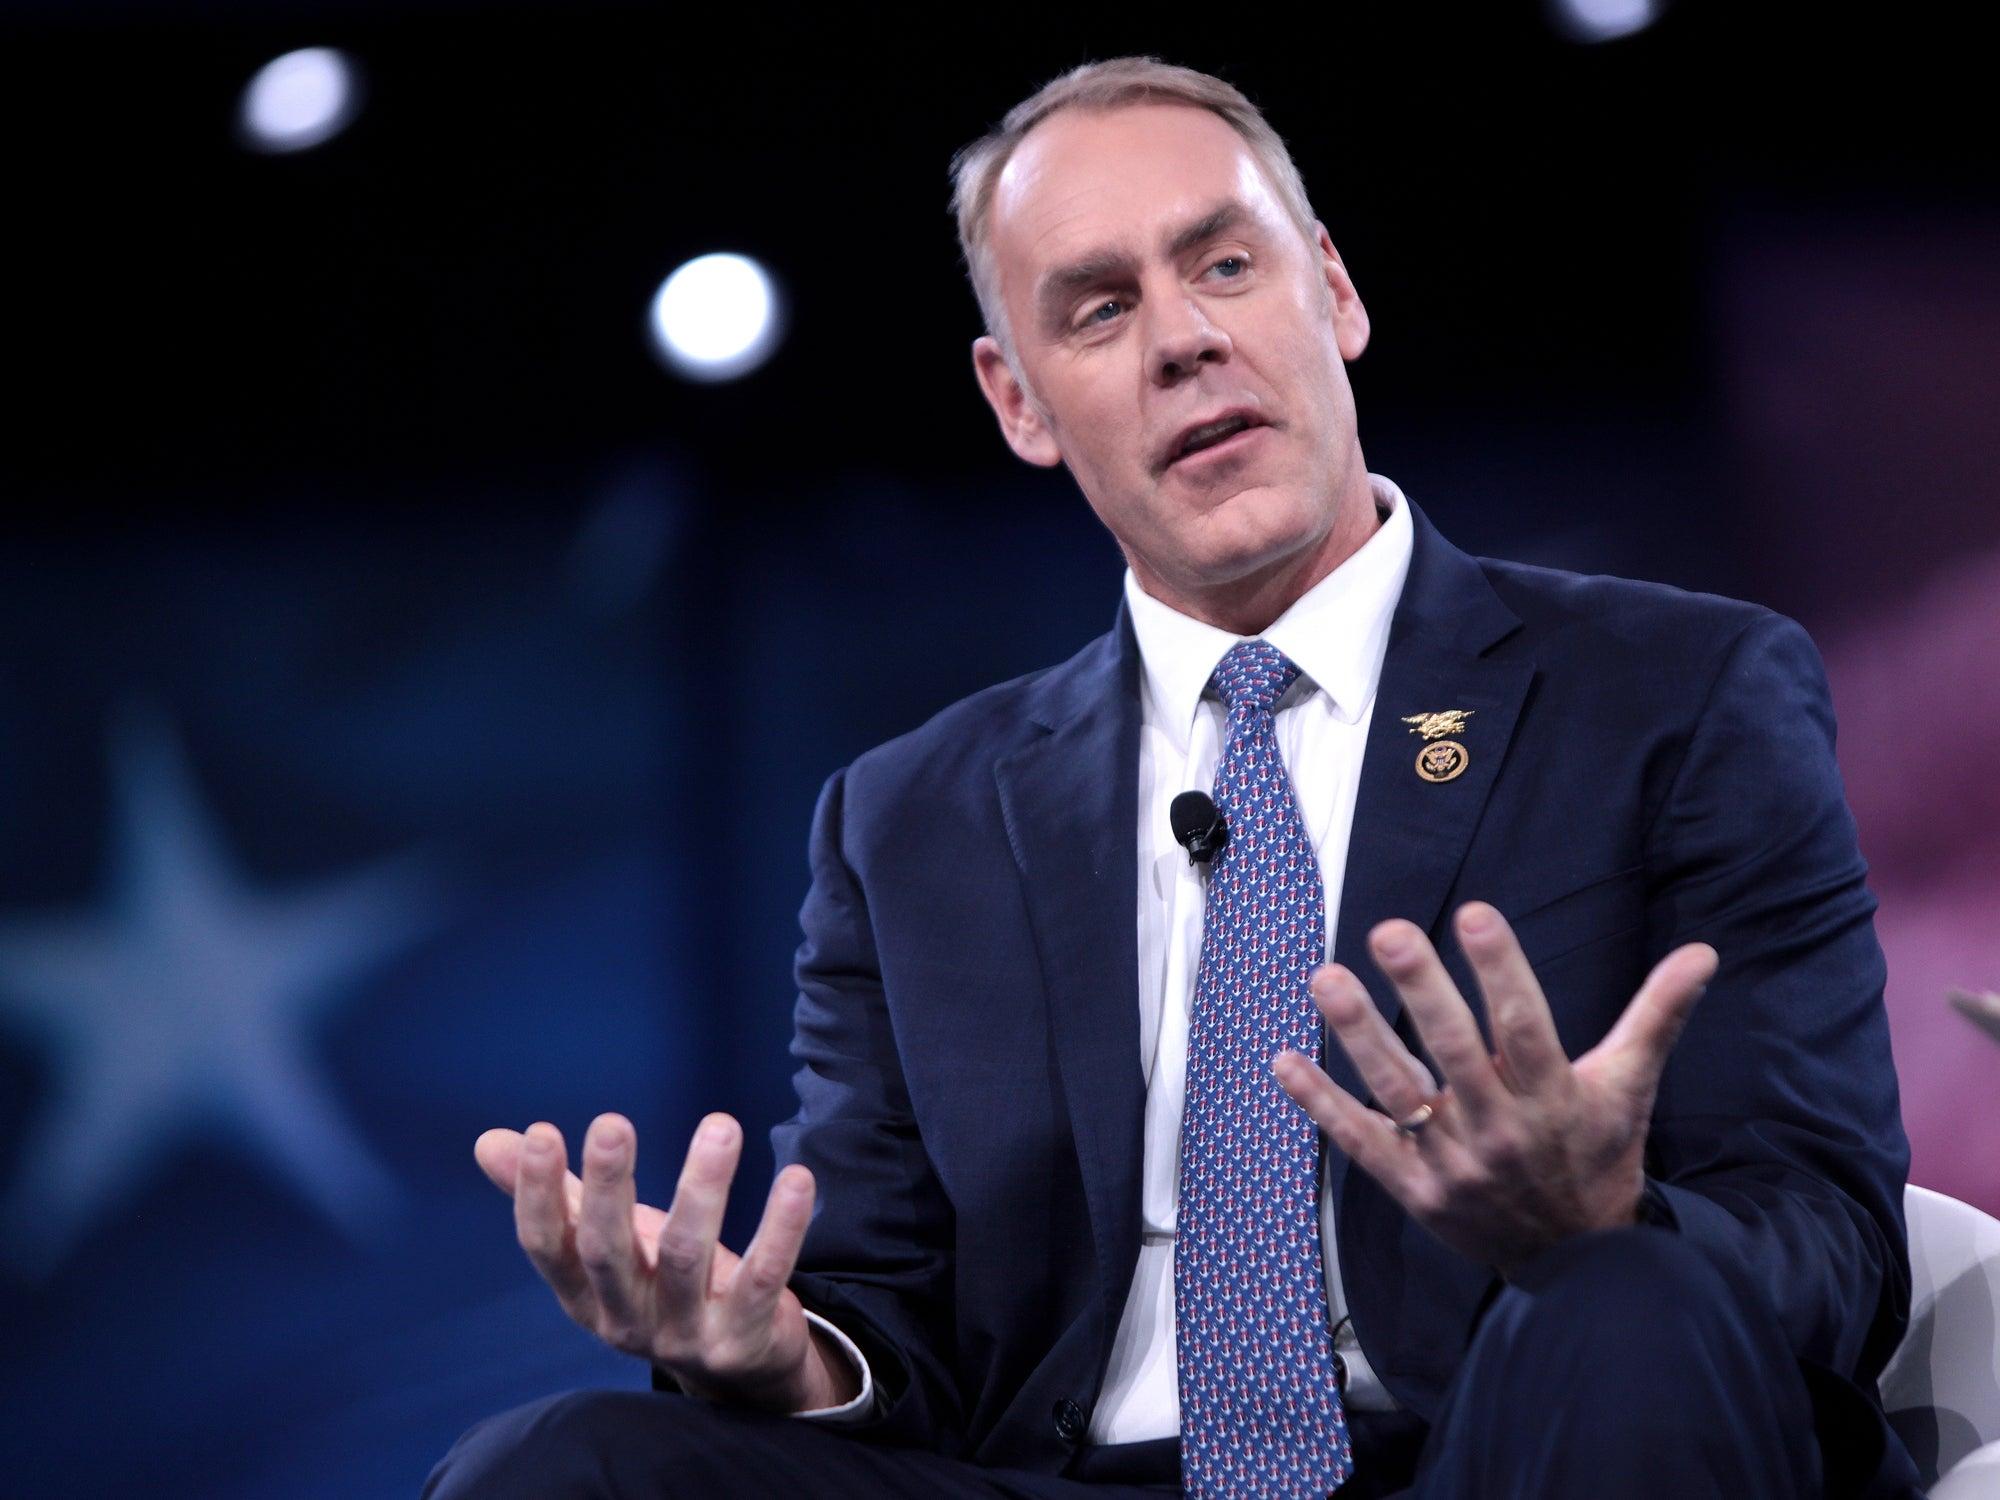 Rep. Ryan Zinke Confirmed as Interior Secretary, Sportsmen's Groups Approve